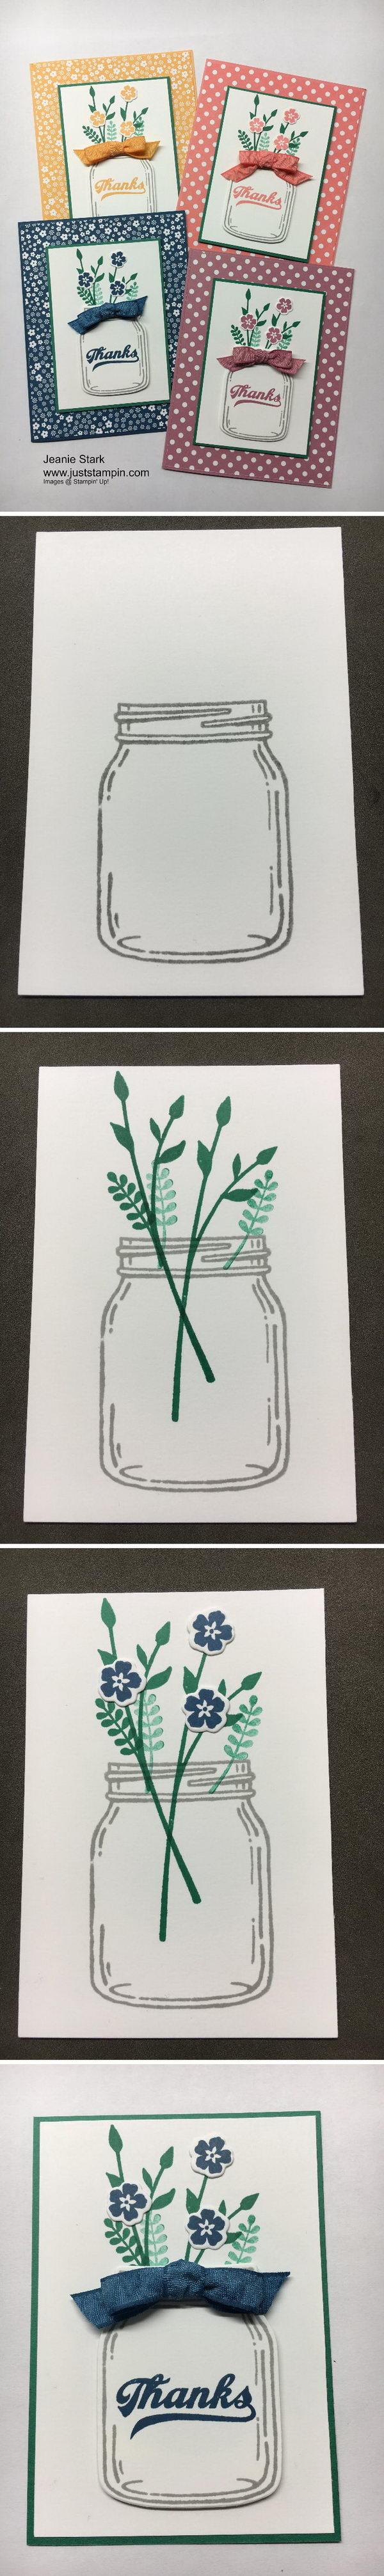 Thanks Jar of Love Card.